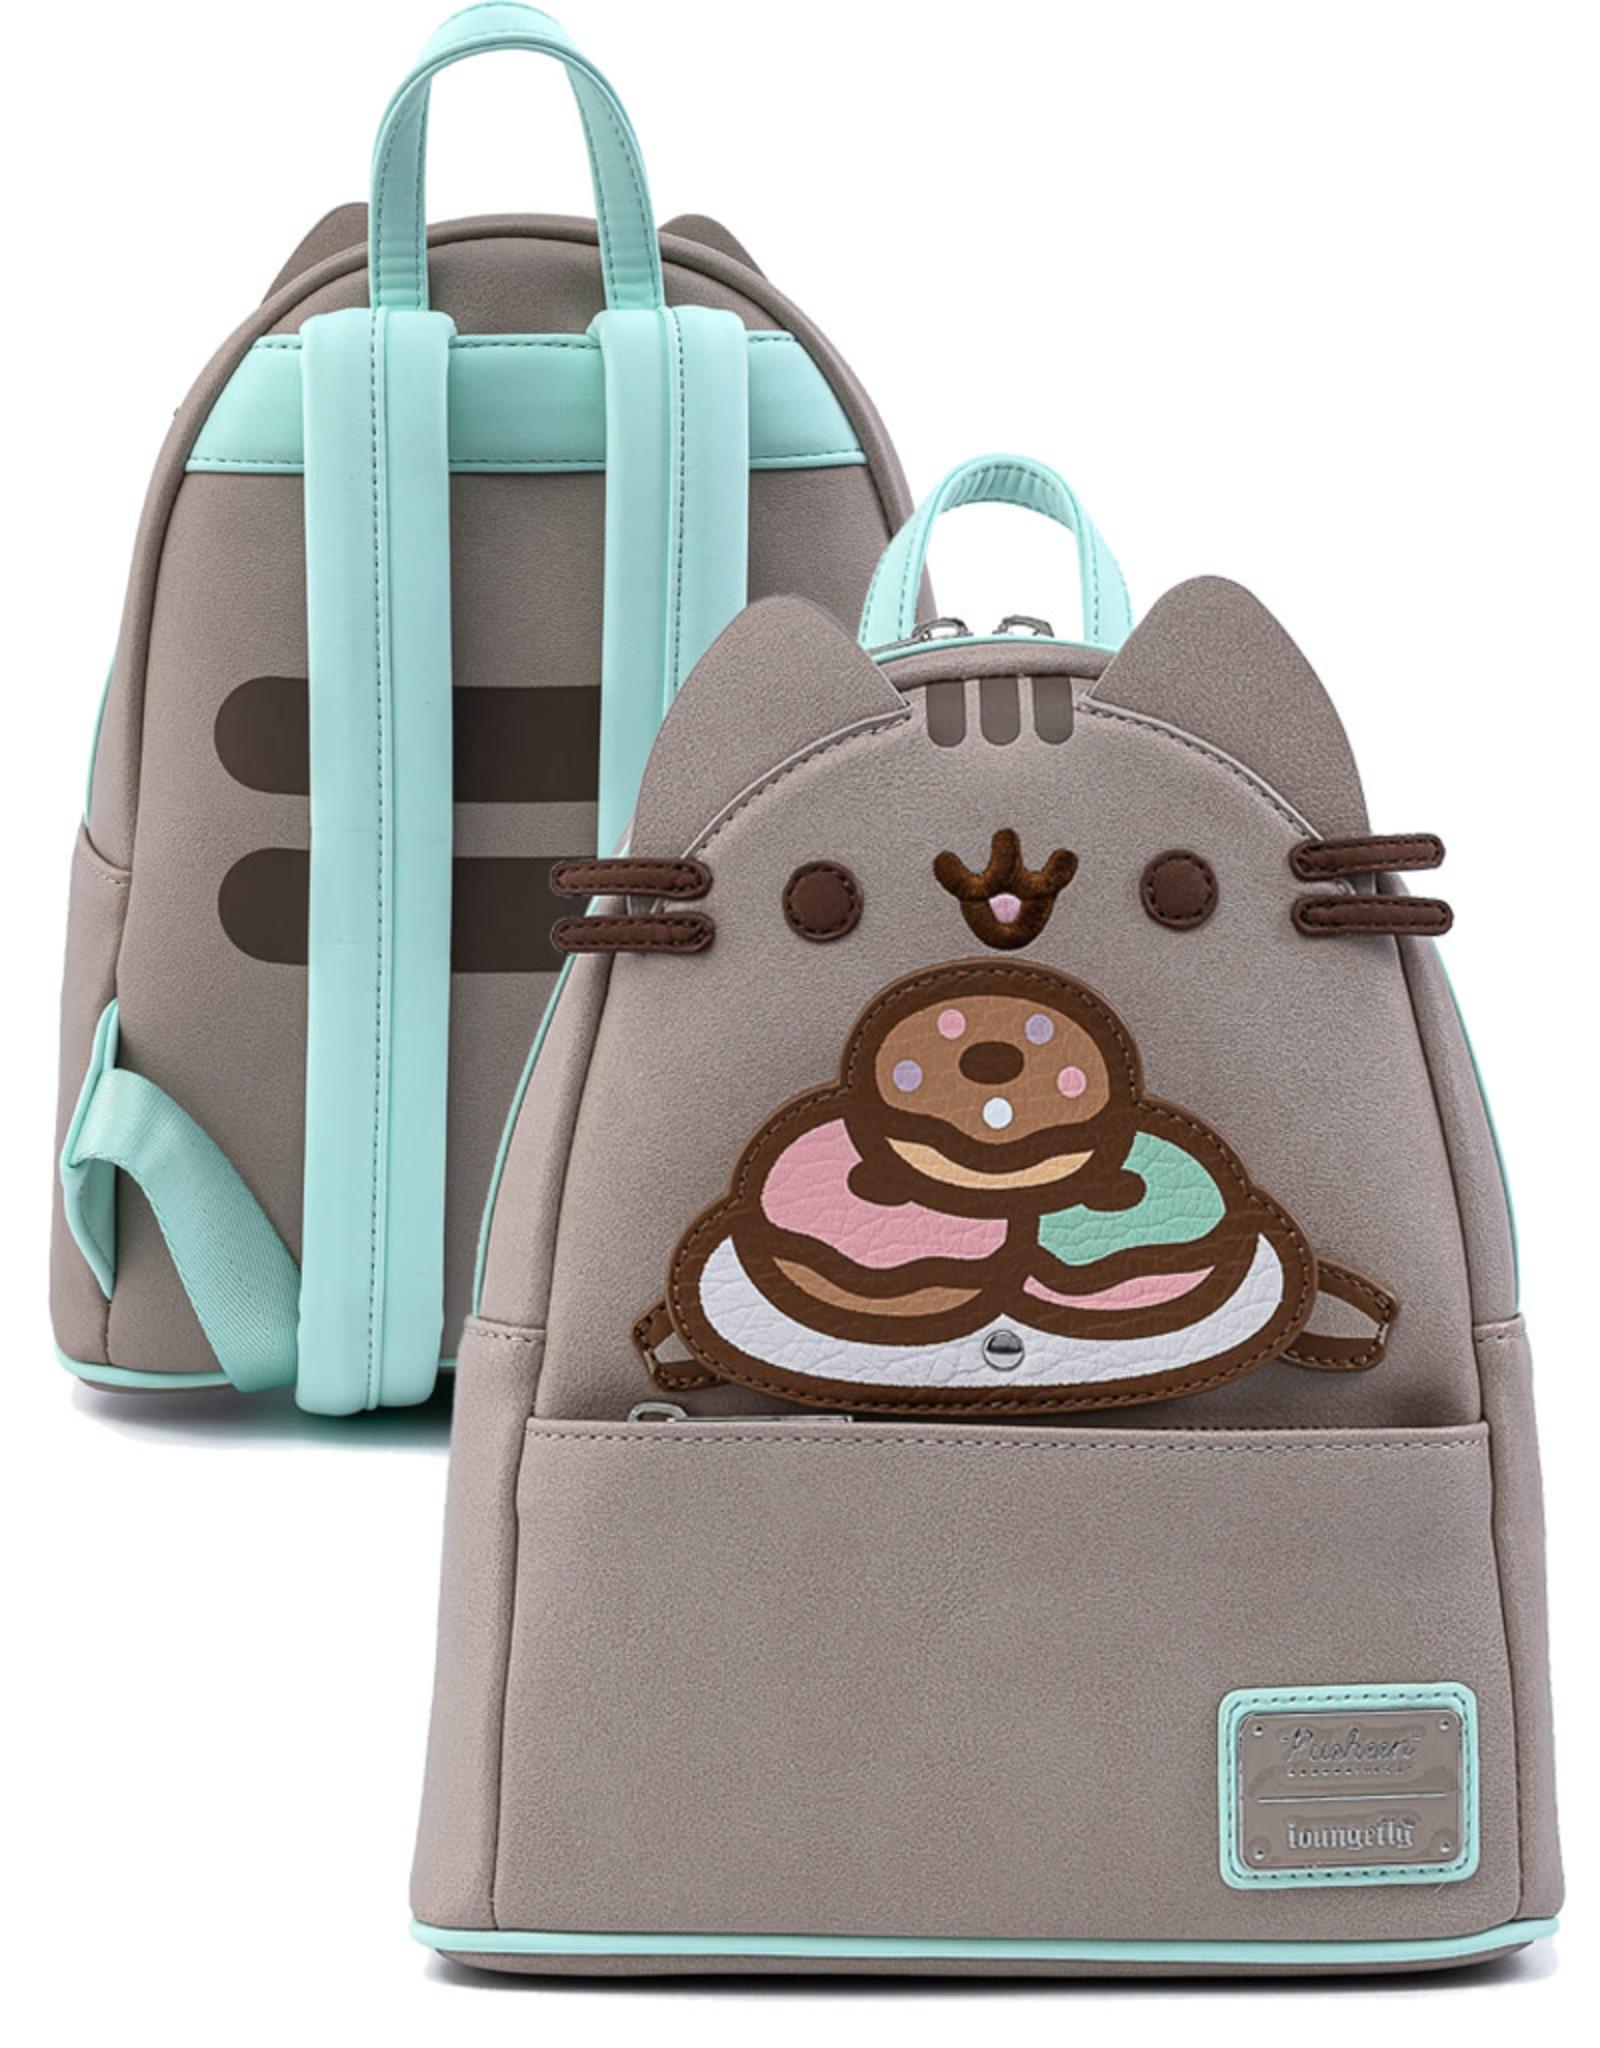 Pusheen ( Loungefly Mini Backpack) Donuts